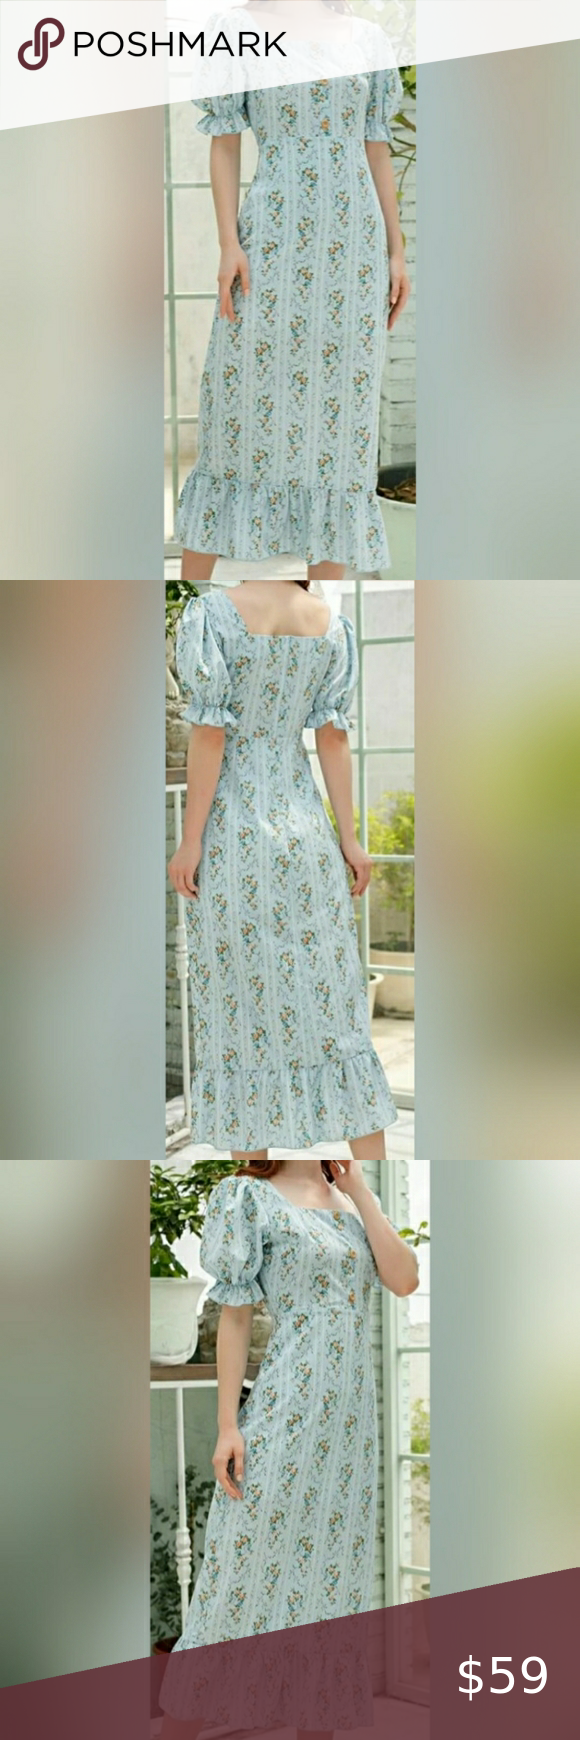 New Vintage Square Neck Floral Ruffle Hem Dress In 2020 Flowy Dress Boho Lace White Dress Satin Wrap Dress [ 1740 x 580 Pixel ]